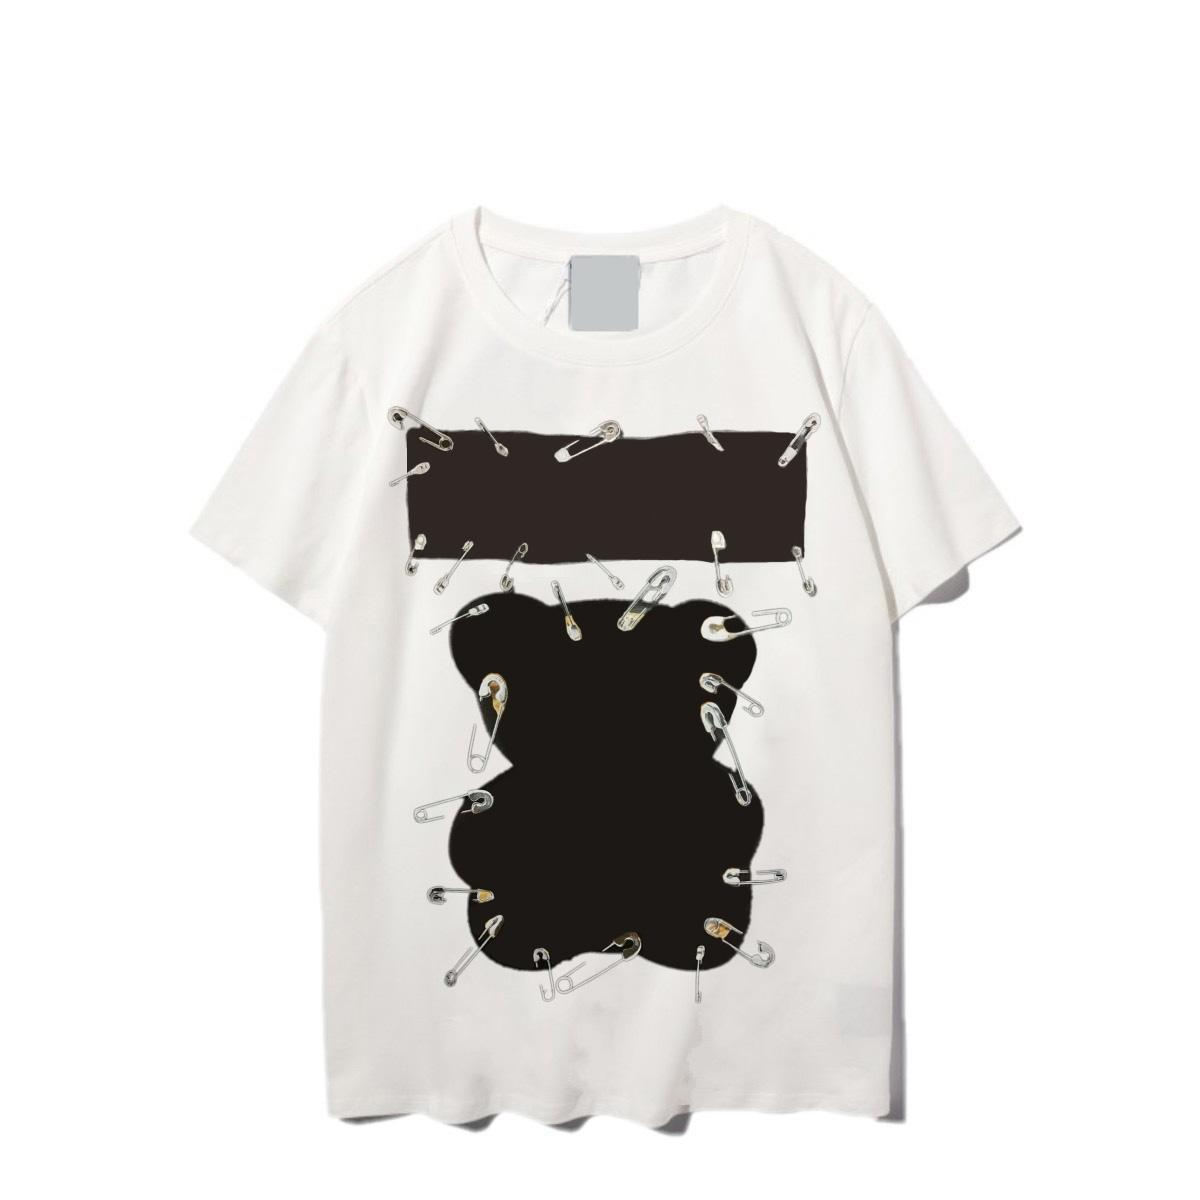 Uniex Women Animal Print T shirt Men Casual Tees Summer Ins Style Fashion Top Man Short Sleeve Trendy Hip hop Street Clothes Streetwear2021